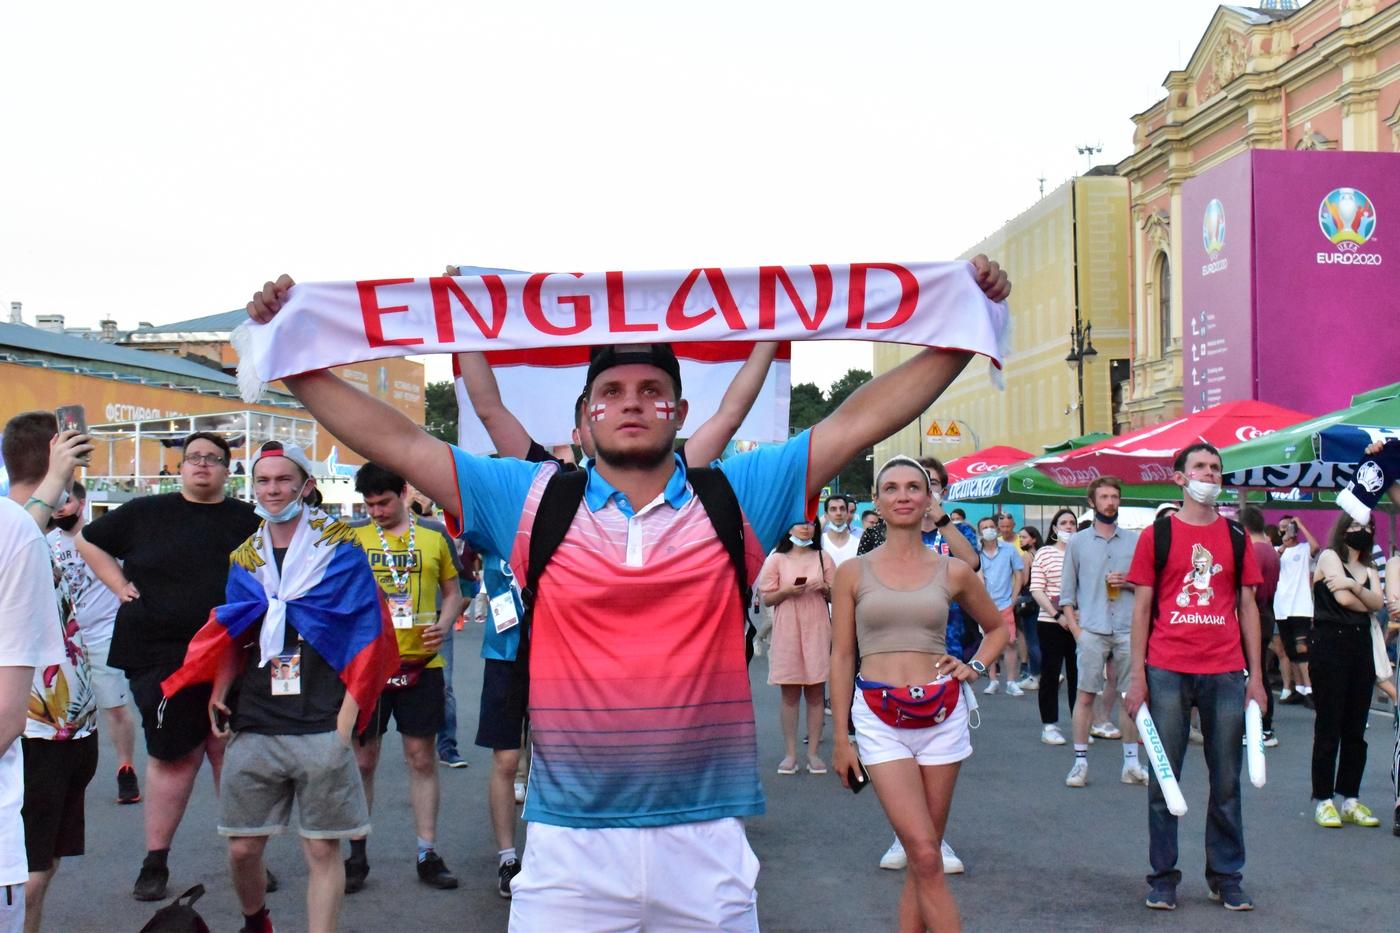 Англия футбол. Сборная Англии по футболу. Евро 2020. Харри Кейн. Стрелинг. Голы на Евро. Англия победила. Чемпионат Европы по футболу